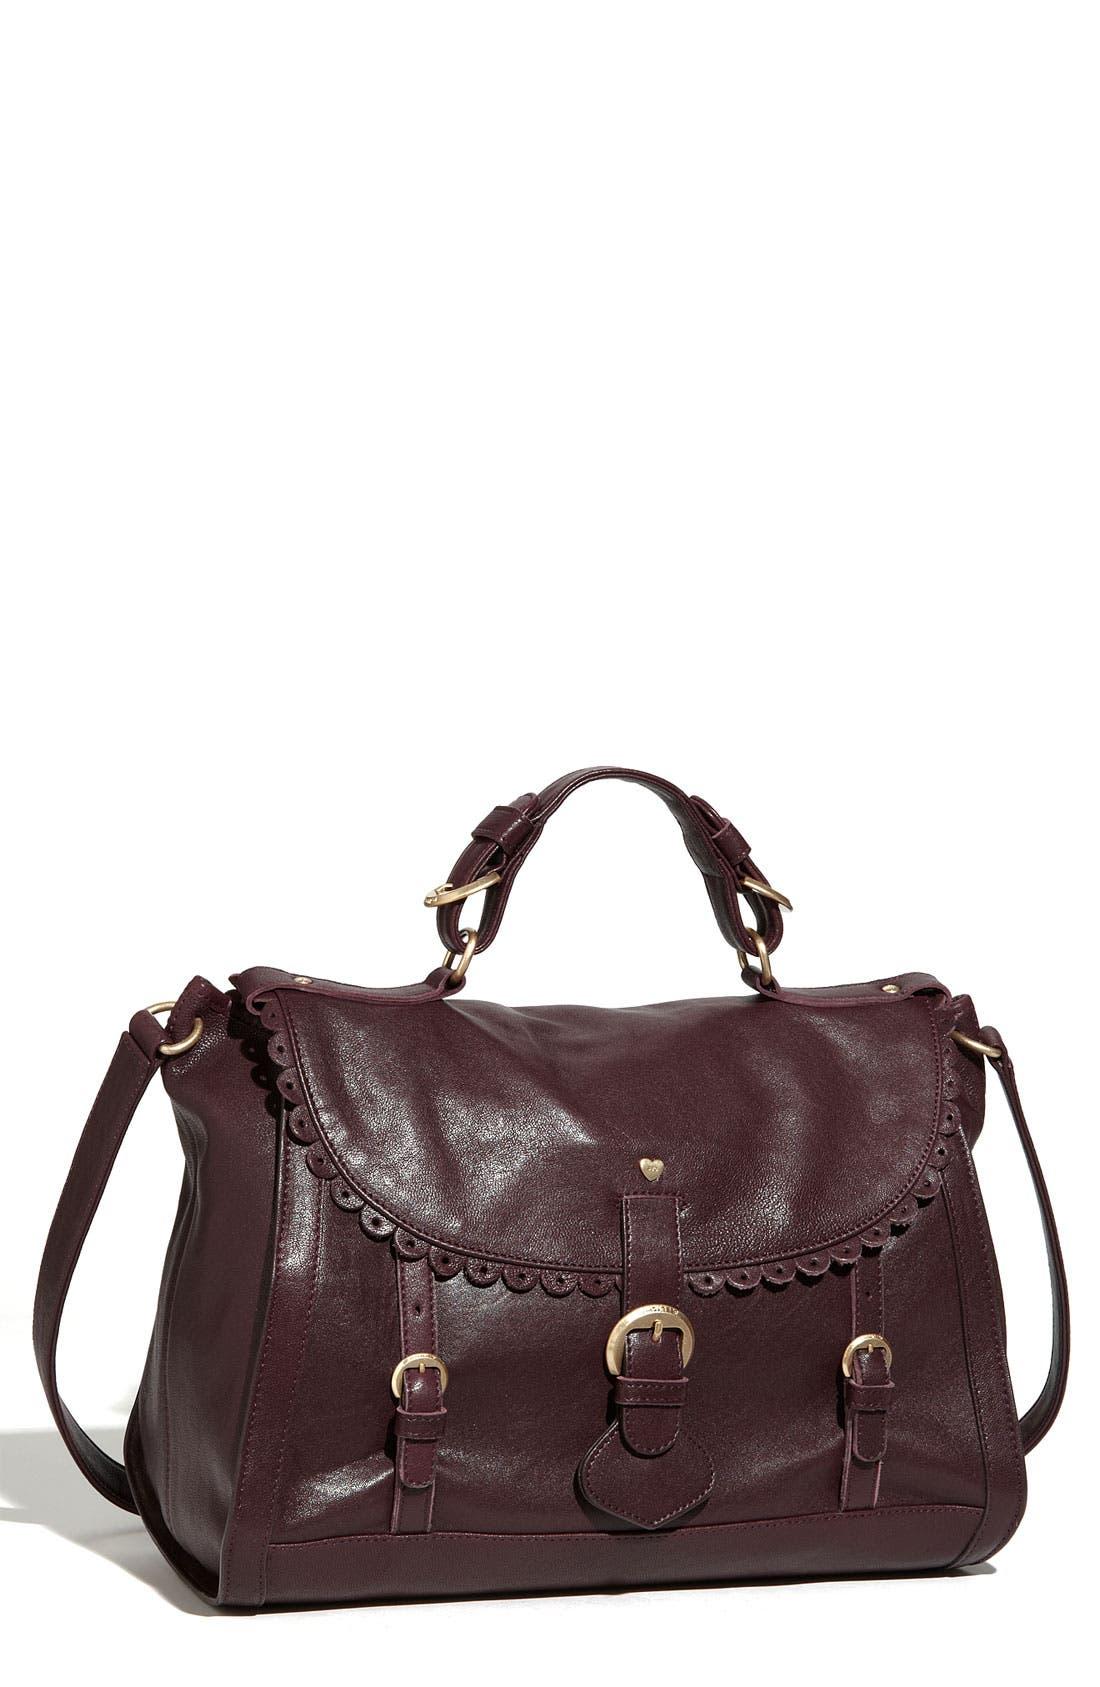 Alternate Image 1 Selected - See By Chloé 'Poya Vintage - Large' Leather Satchel